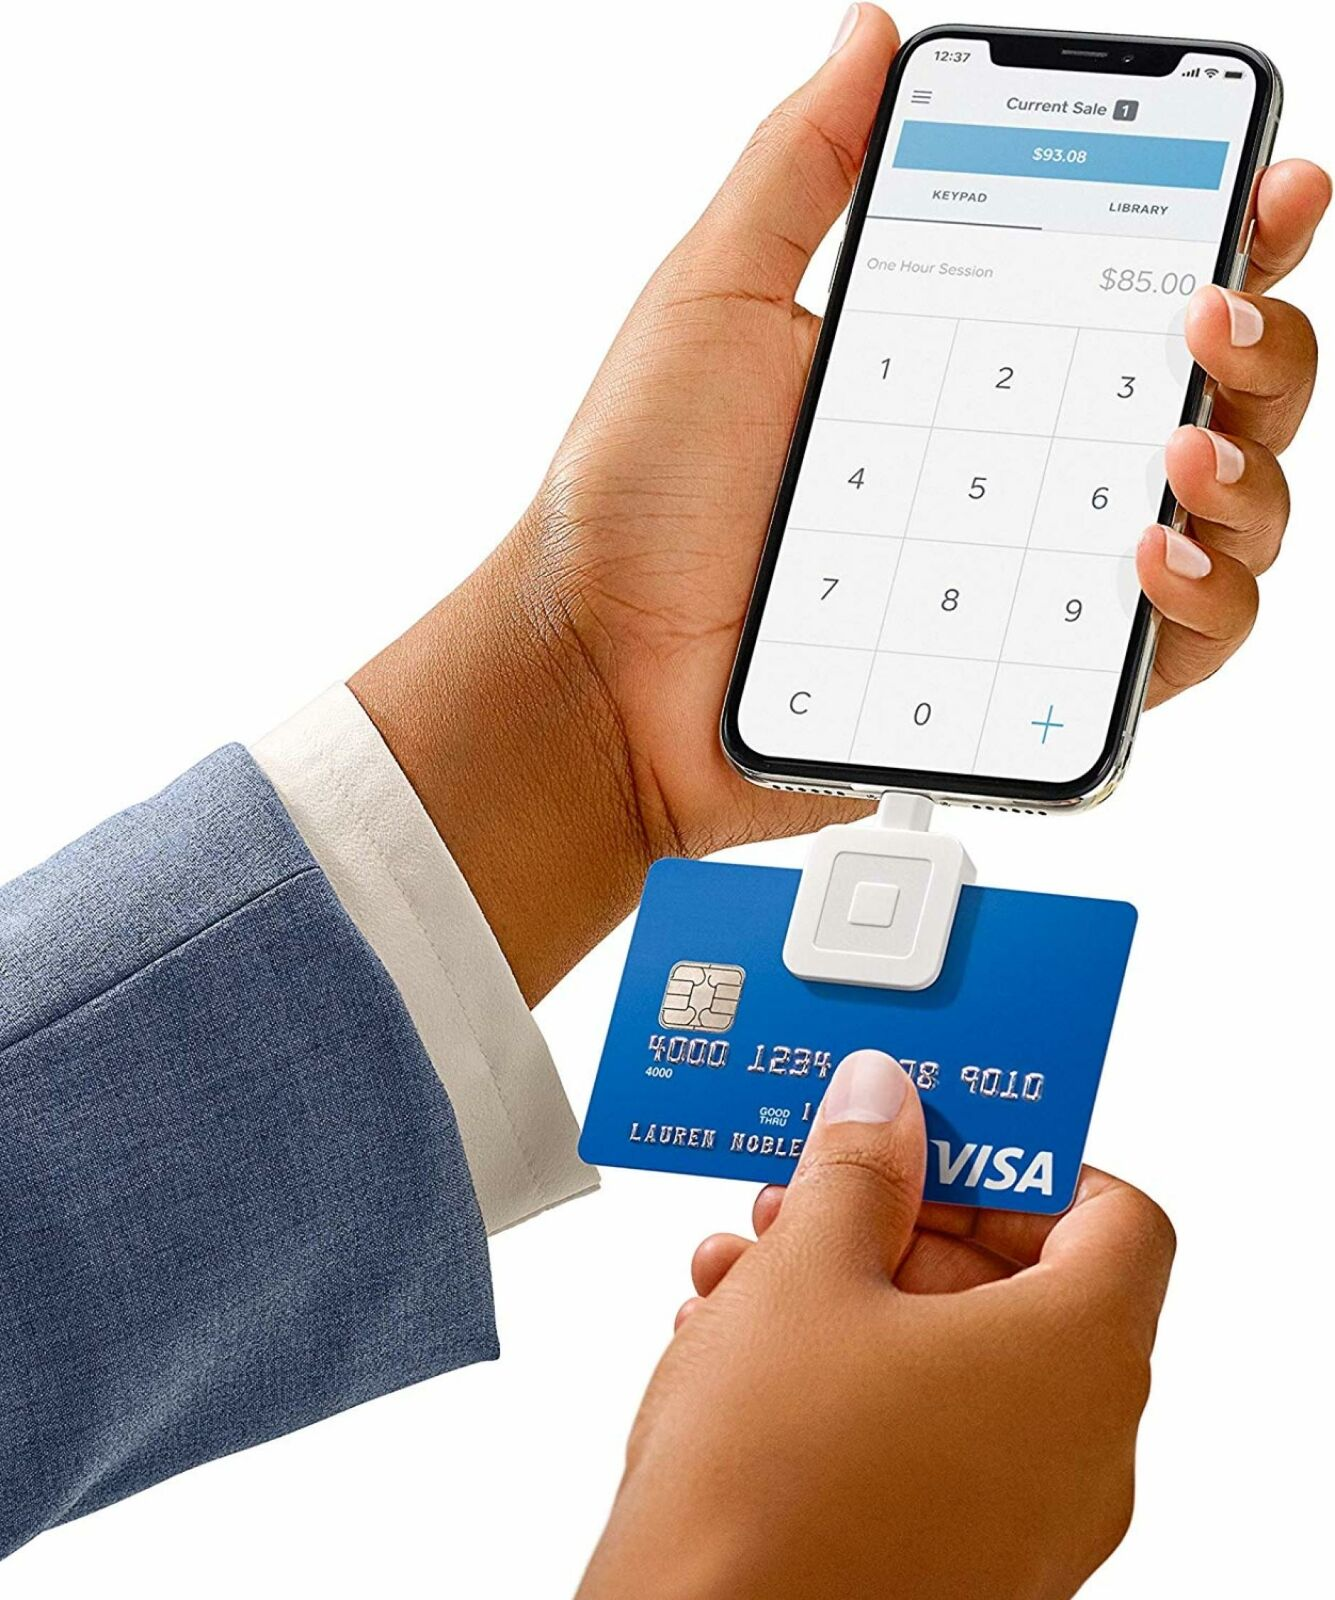 Square Mobile Debit Credit Card Reader Smart Phone IPhone